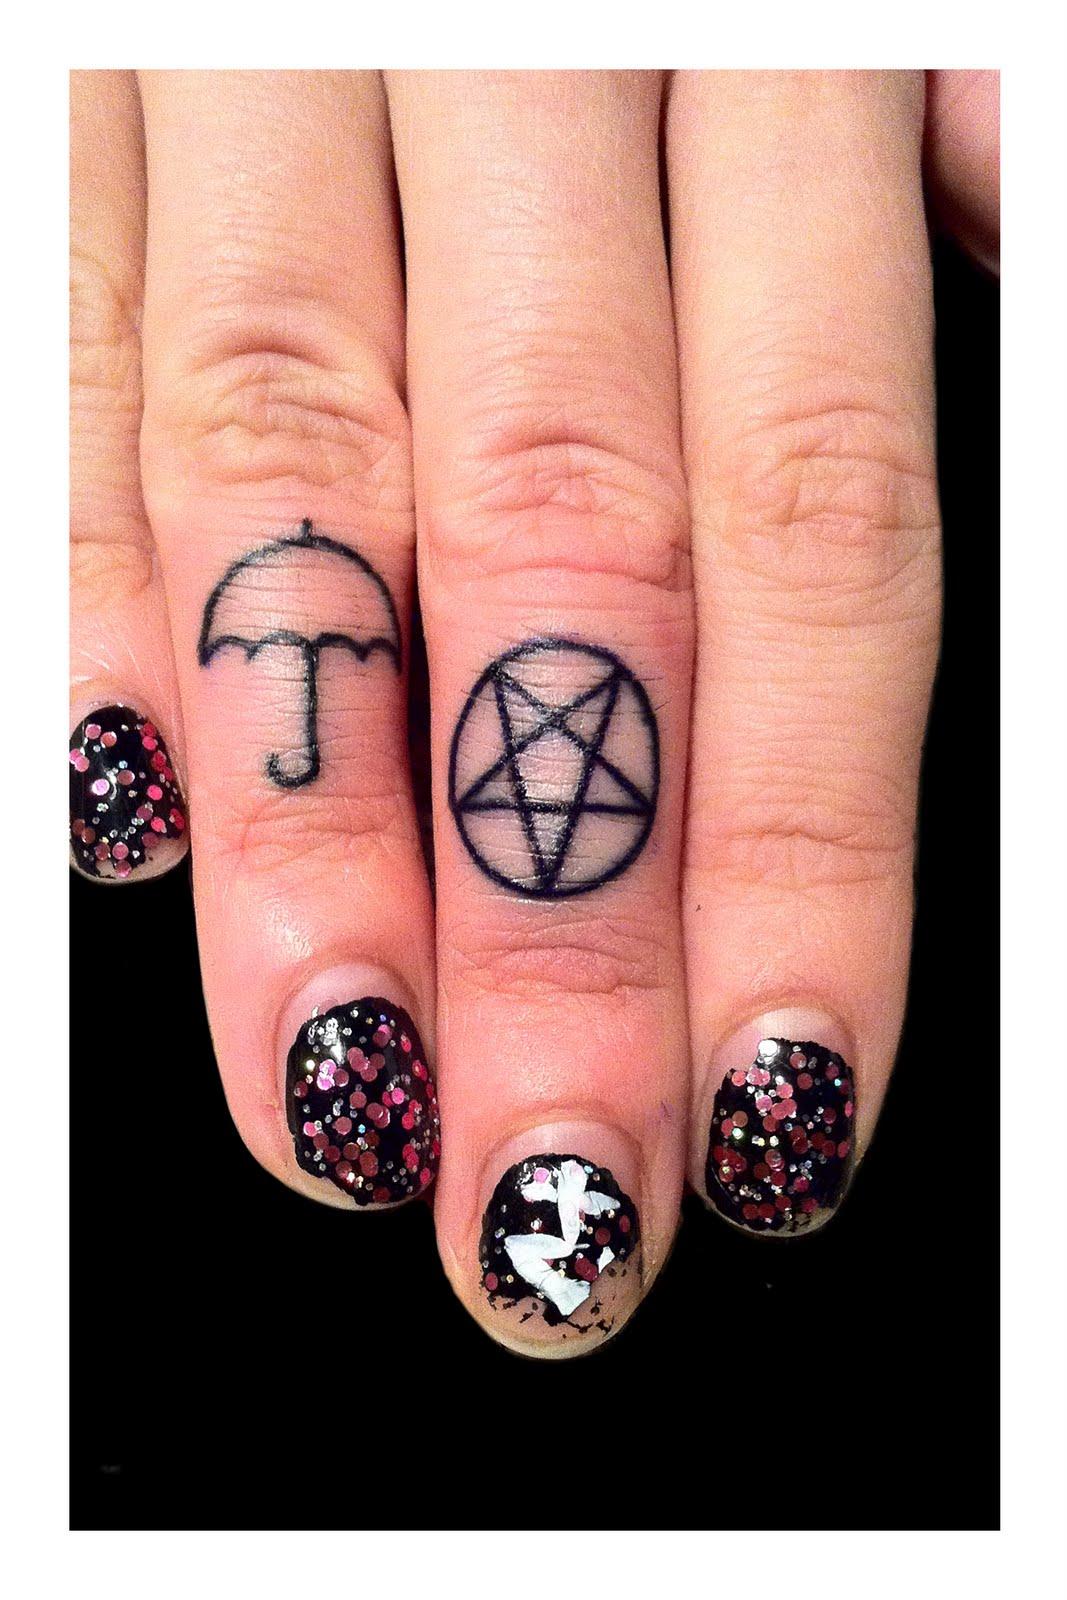 finger tattoo tattoos pentagram umbrella fingers tiny designs hand awesome tattooed area itattooz tatoos ink catie harmen gods monsters tat